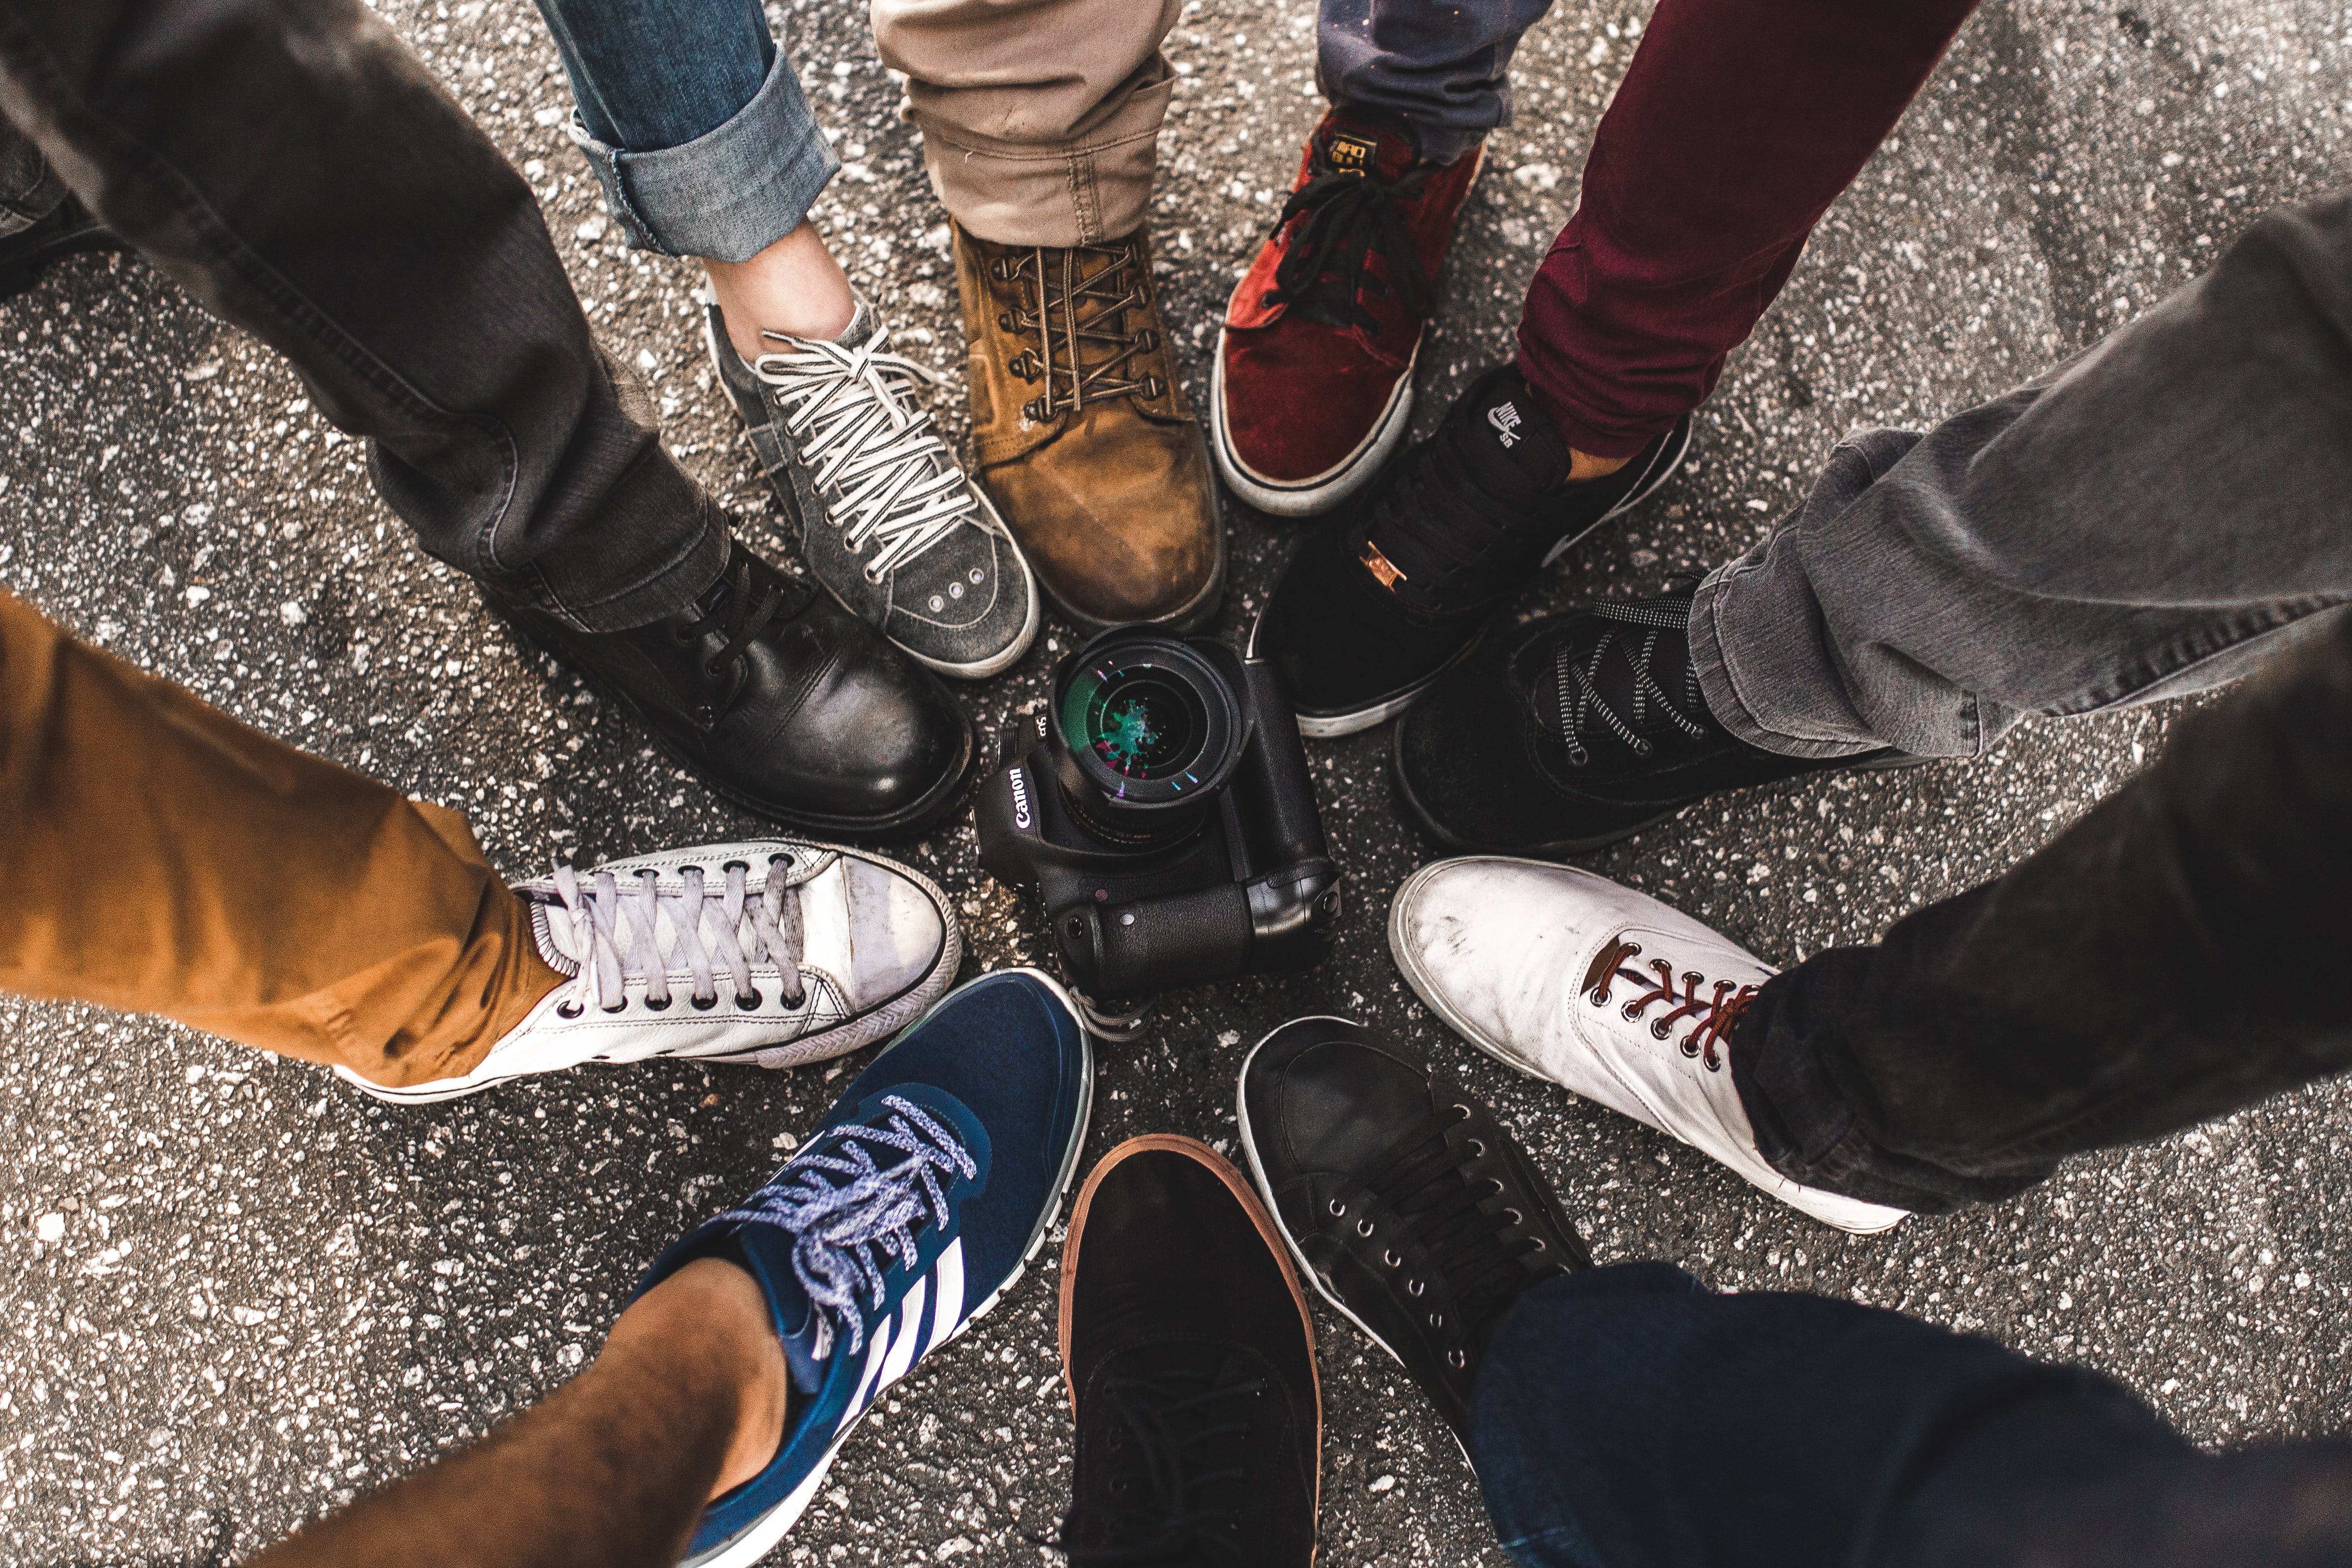 camera, feet, footwear